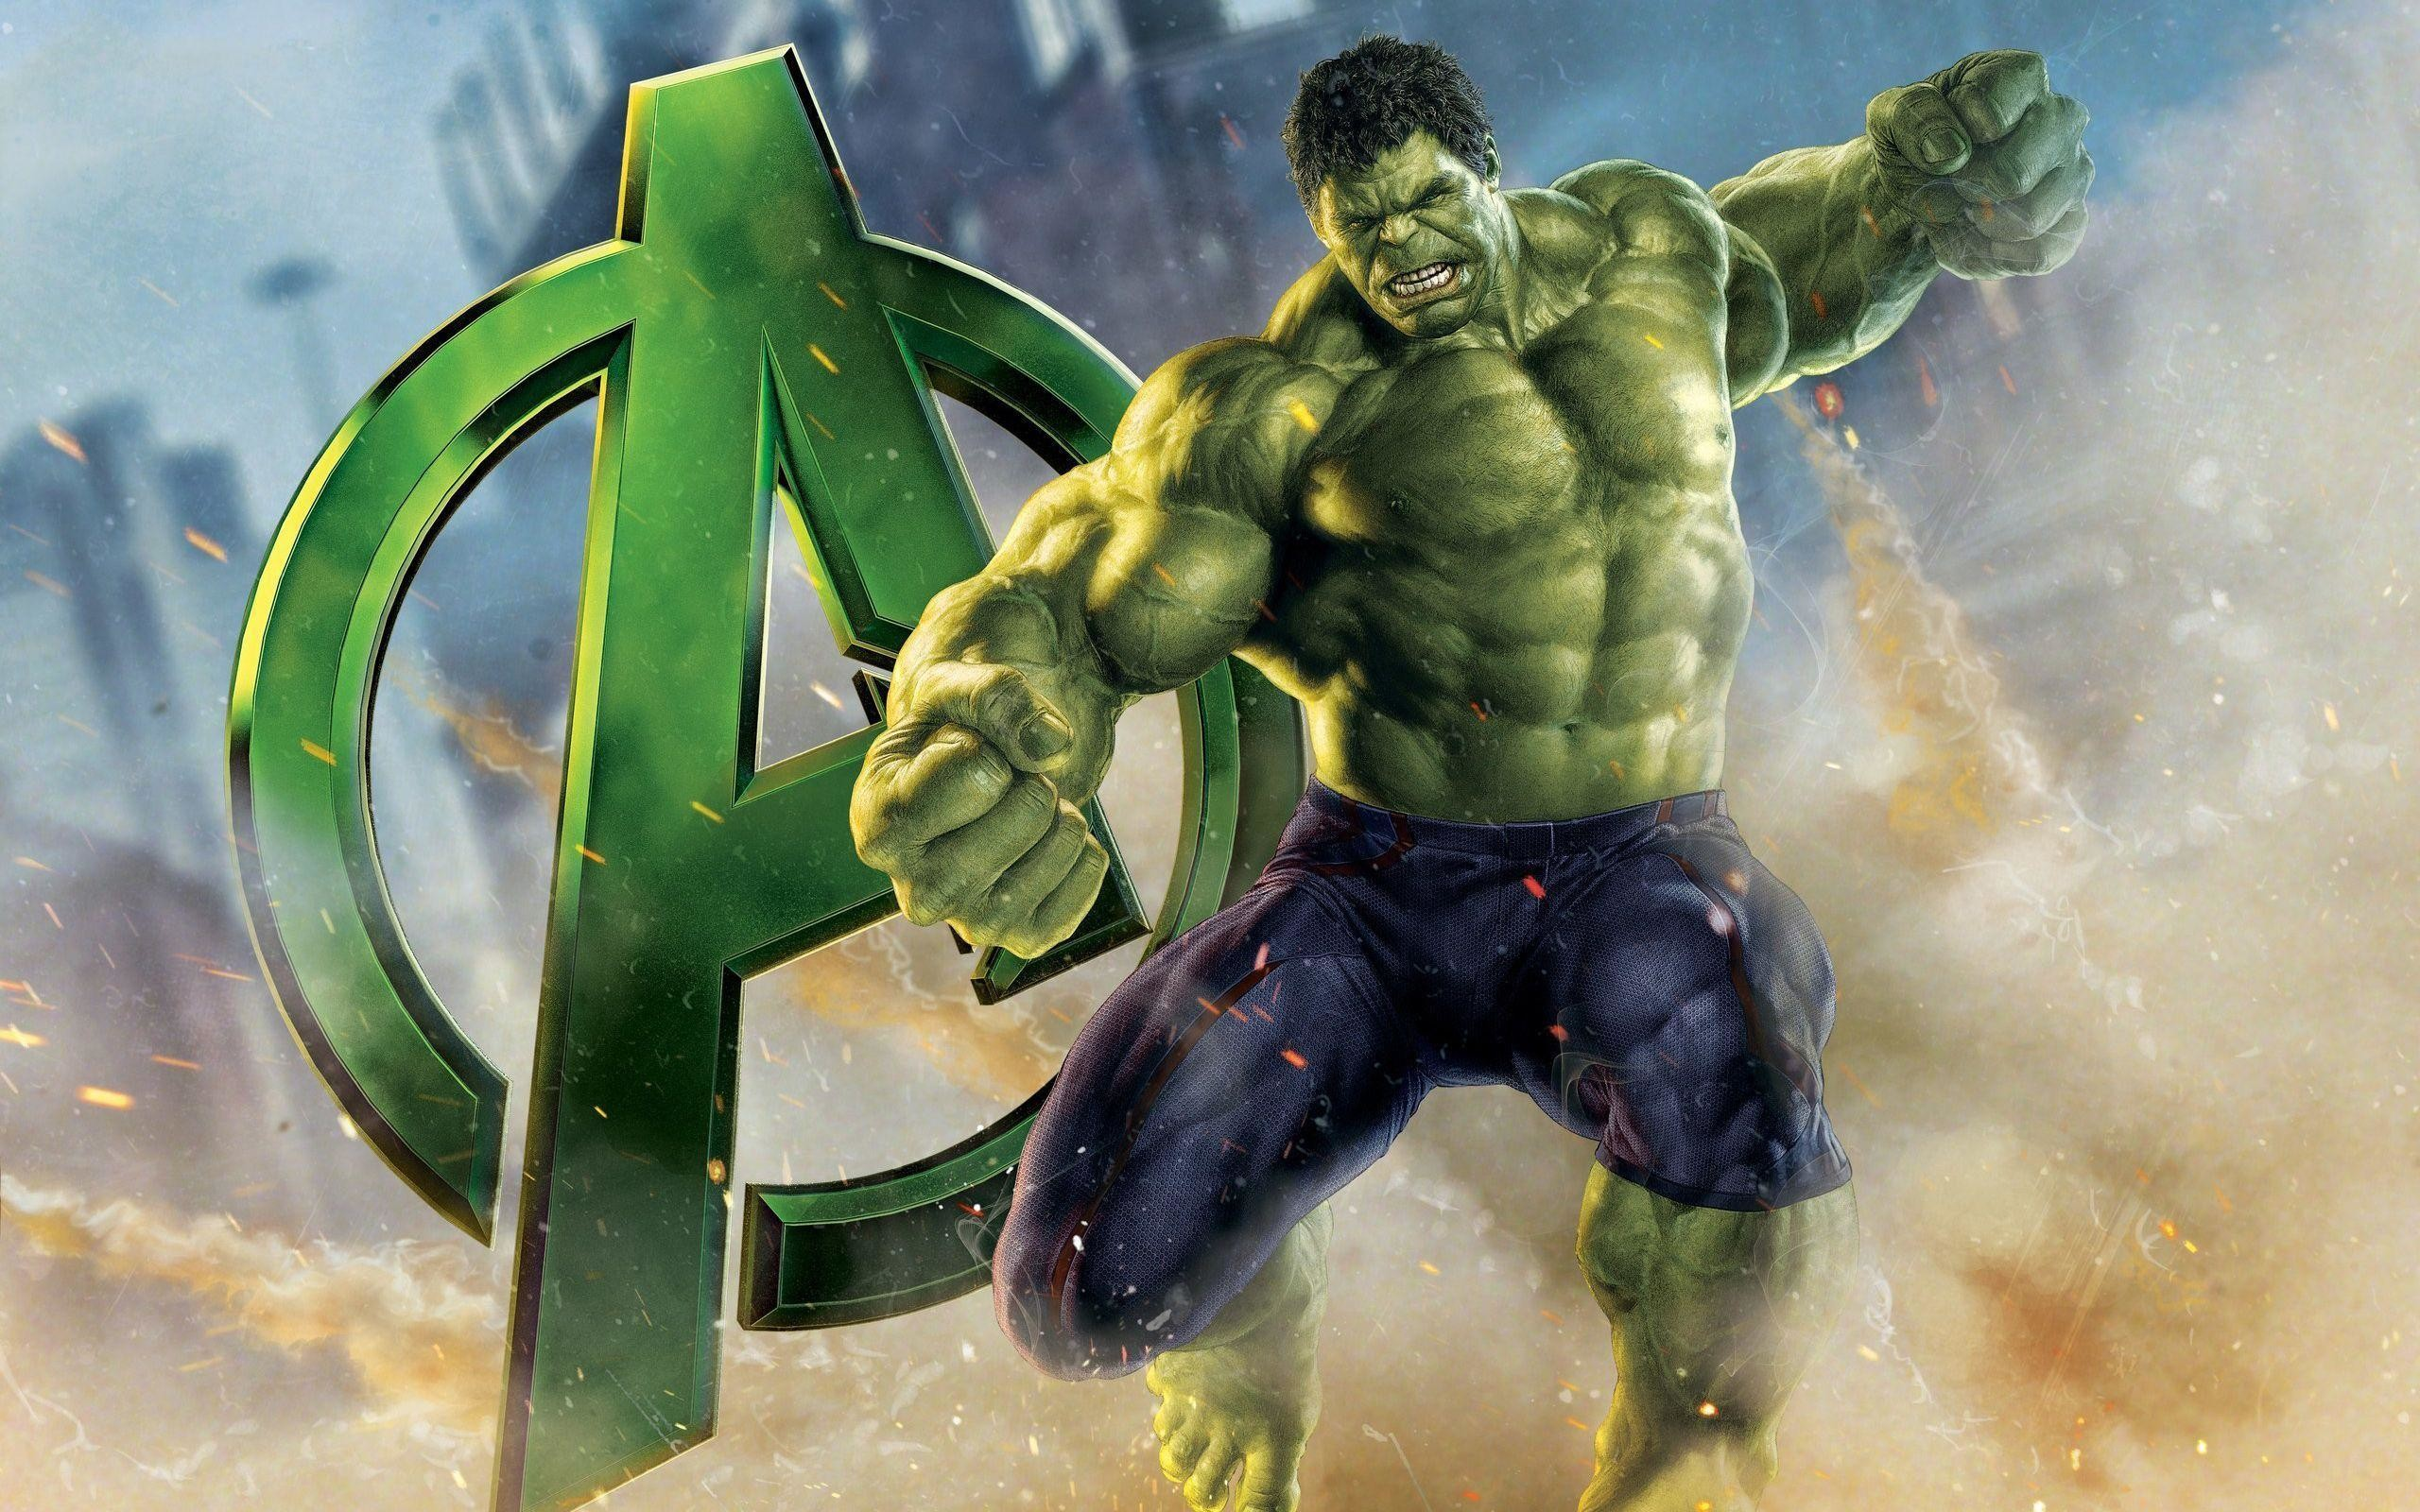 Hulk Vs Hulkbuster Wallpapers | Wallpapers HD